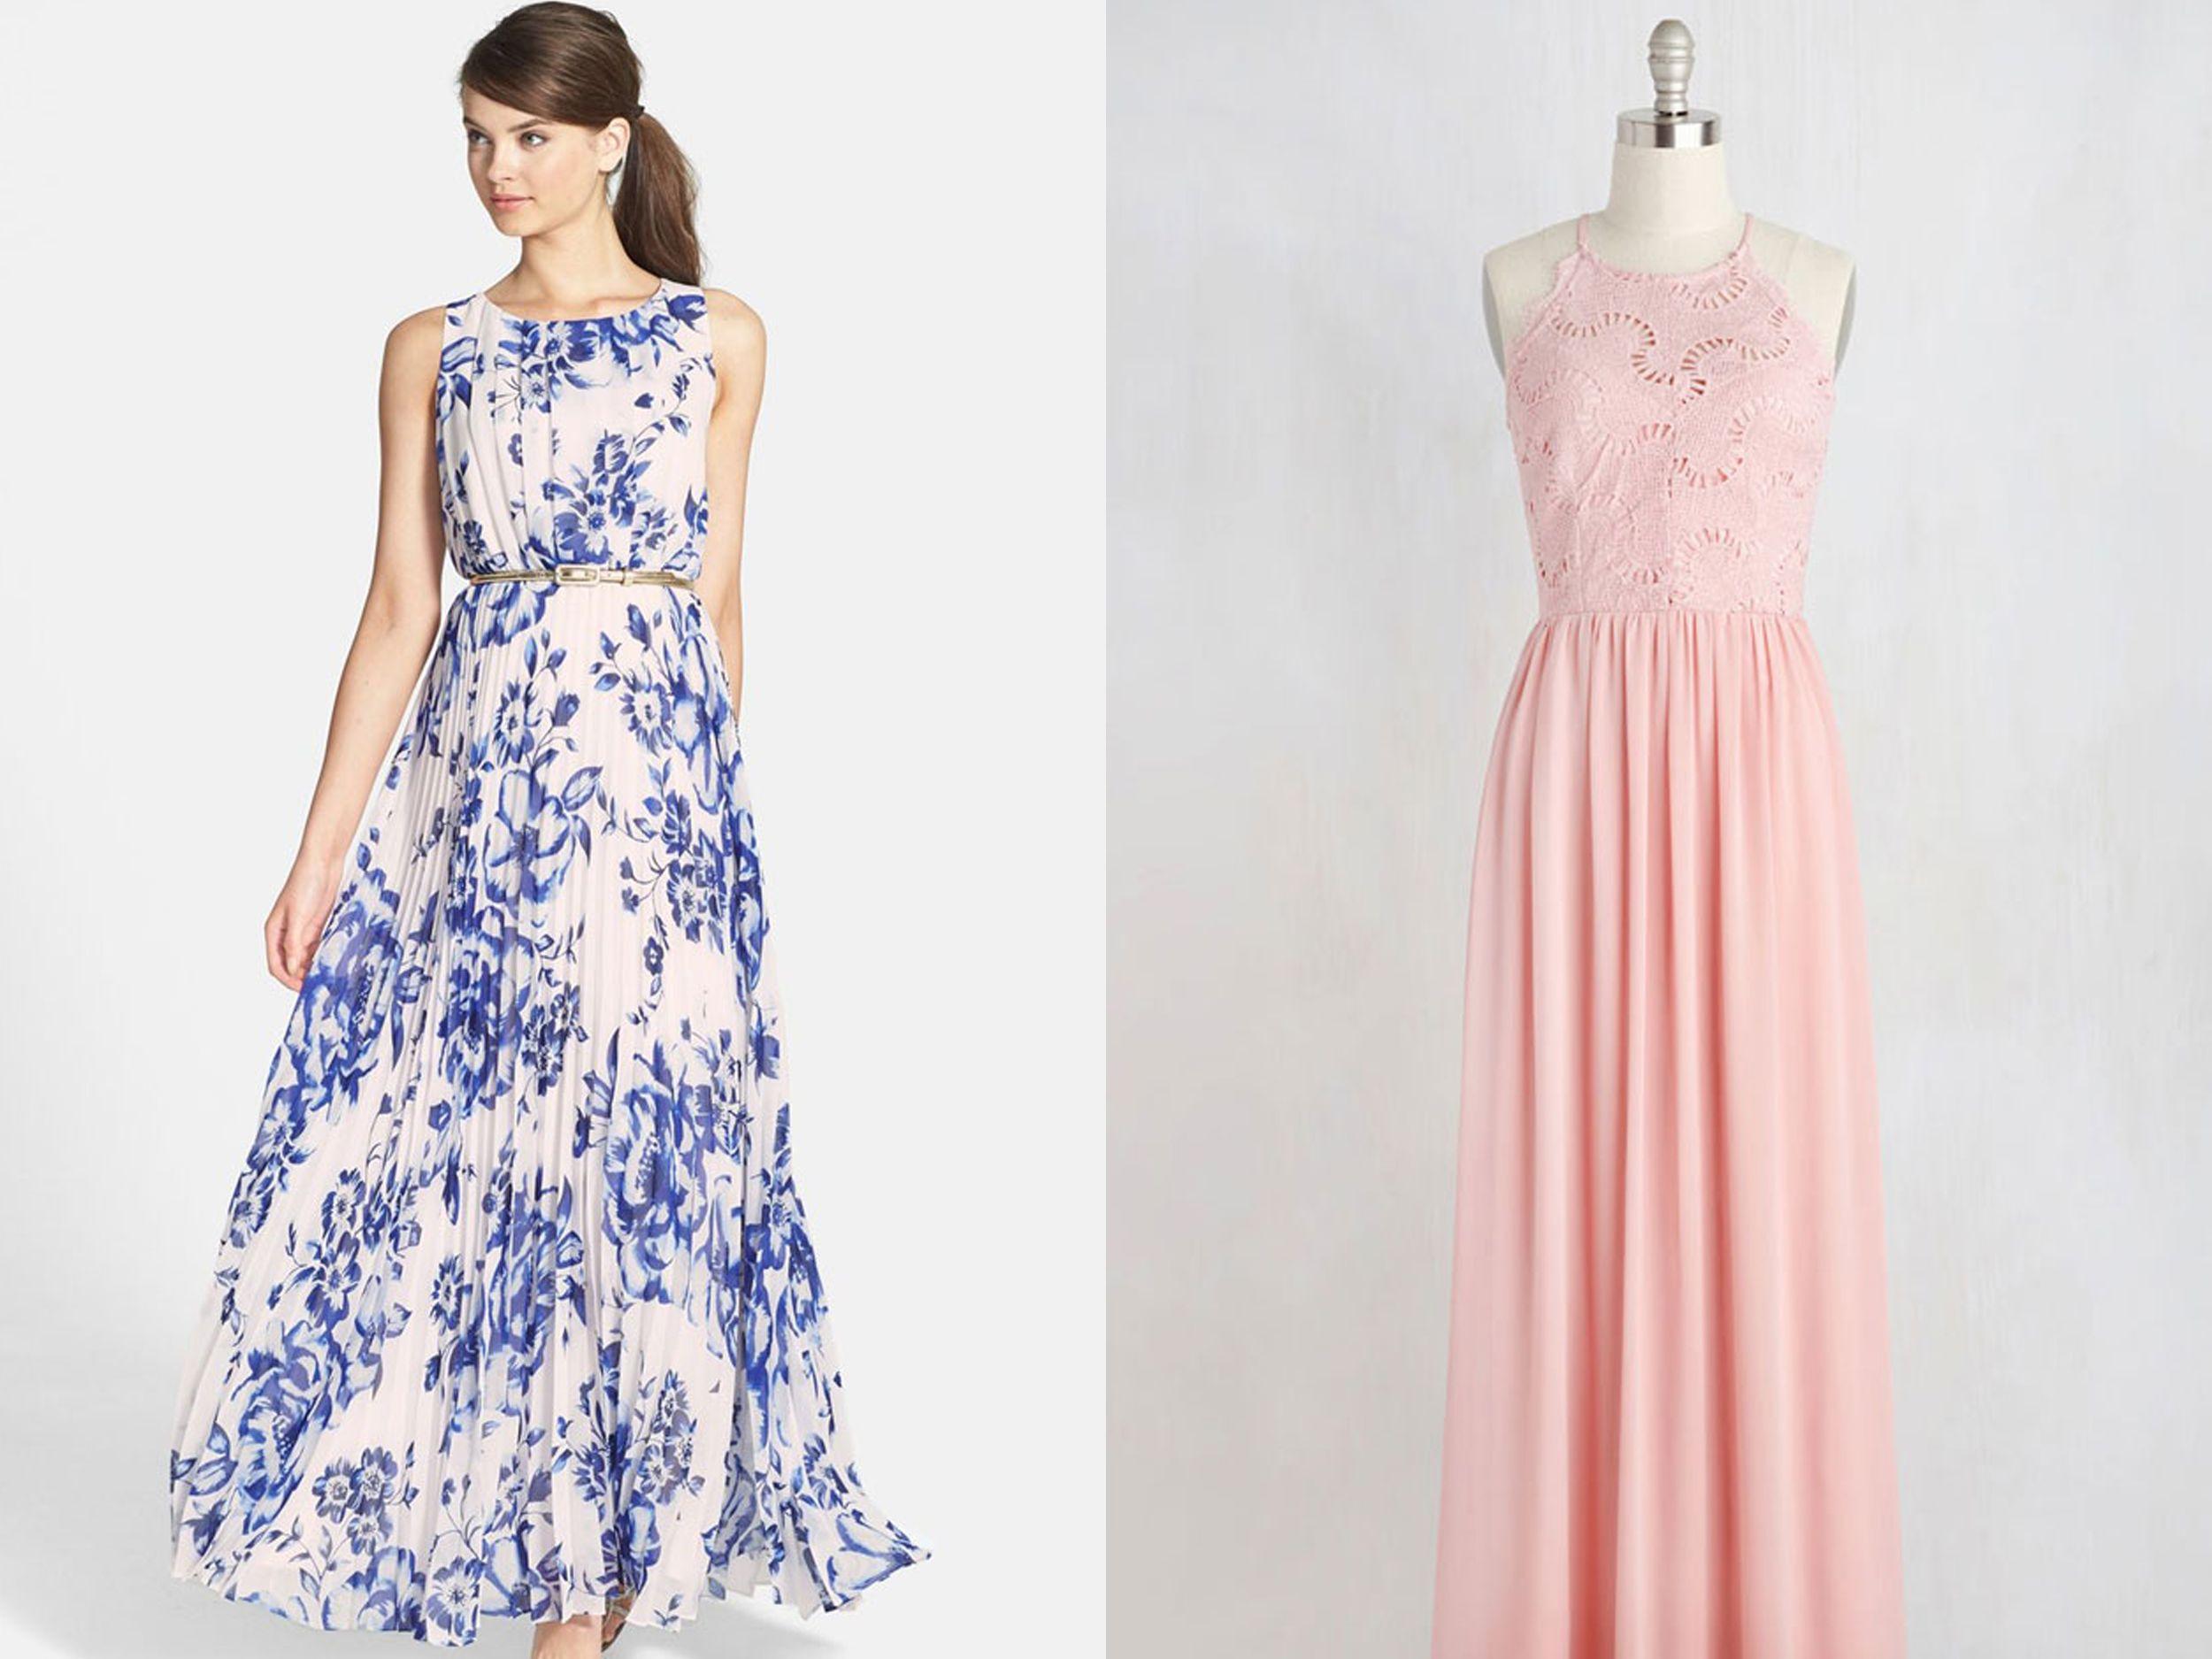 best website to order bridesmaids dresses